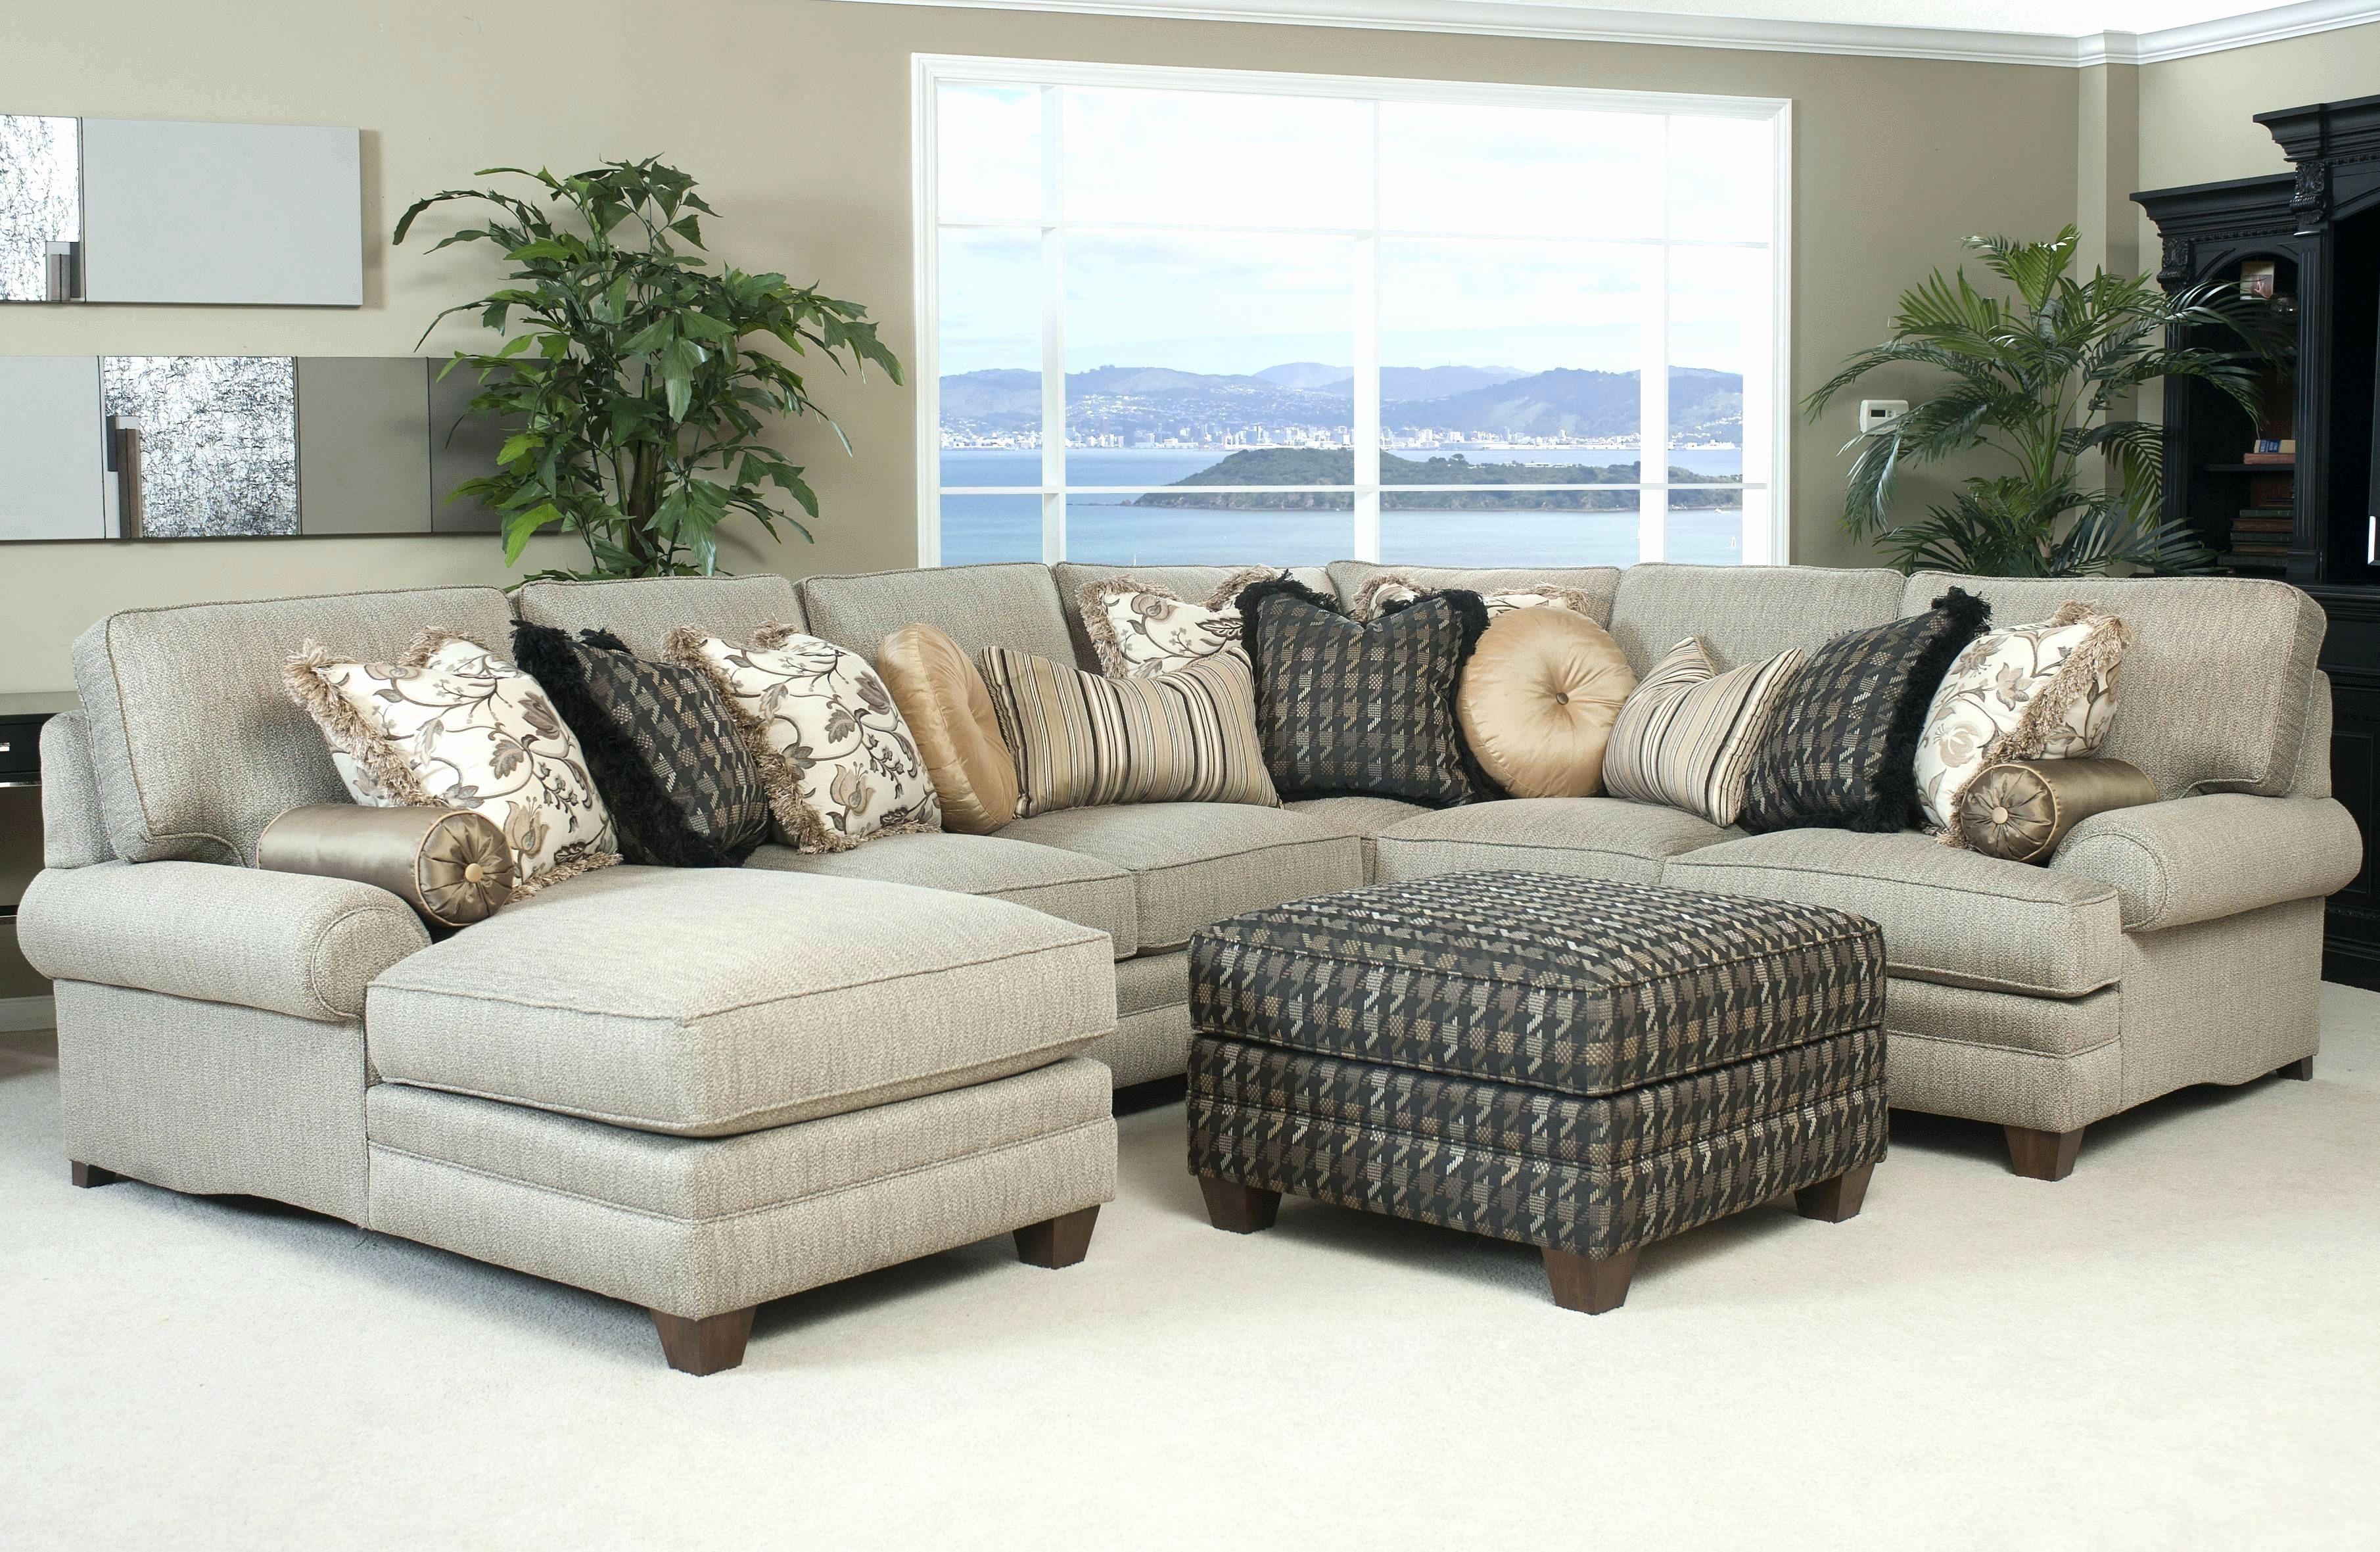 Phenomenal Elegant Contemporary Microfiber Sectional Sofa Pics Gamerscity Chair Design For Home Gamerscityorg